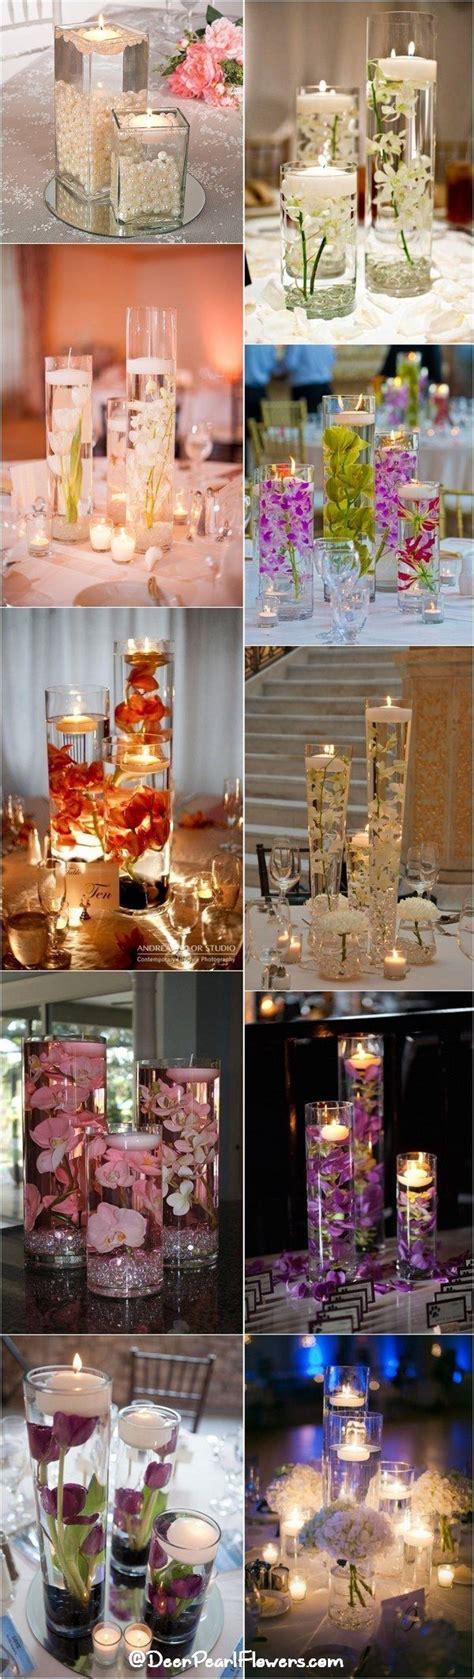 theme centerpiece ideas 1000 ideas about barn wedding centerpieces on